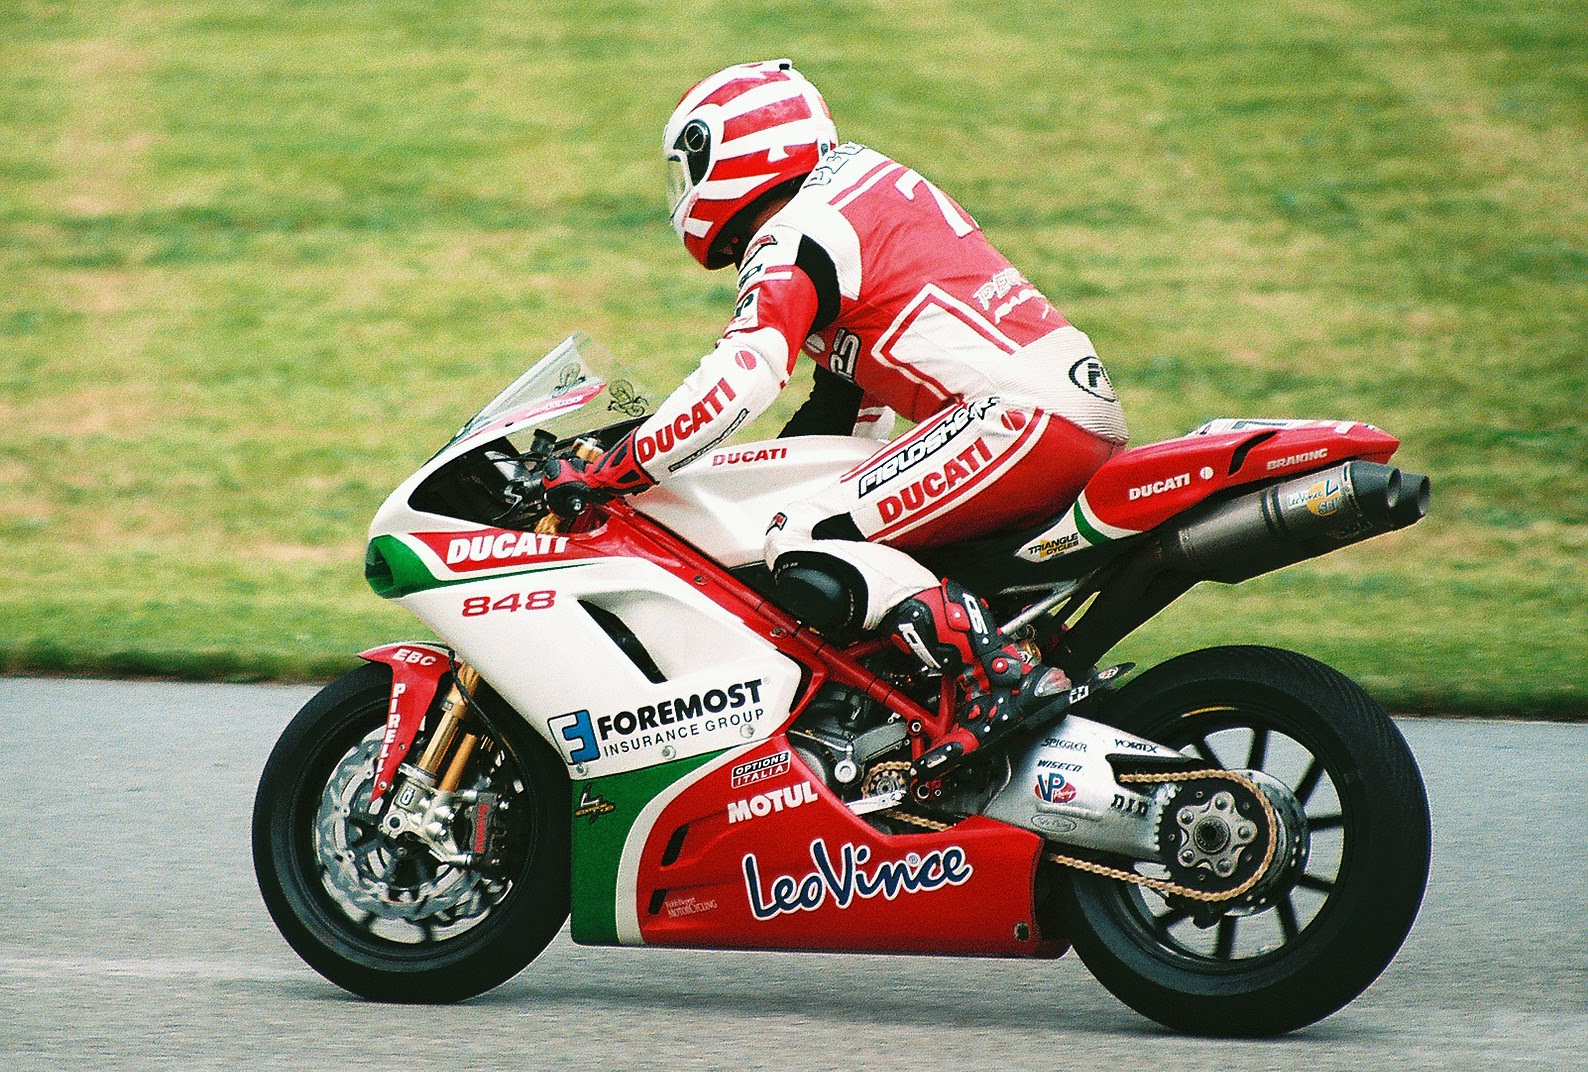 Stu S Shots R Us Larry Pegram To Race Bmw S1000rr In Ama Superbike